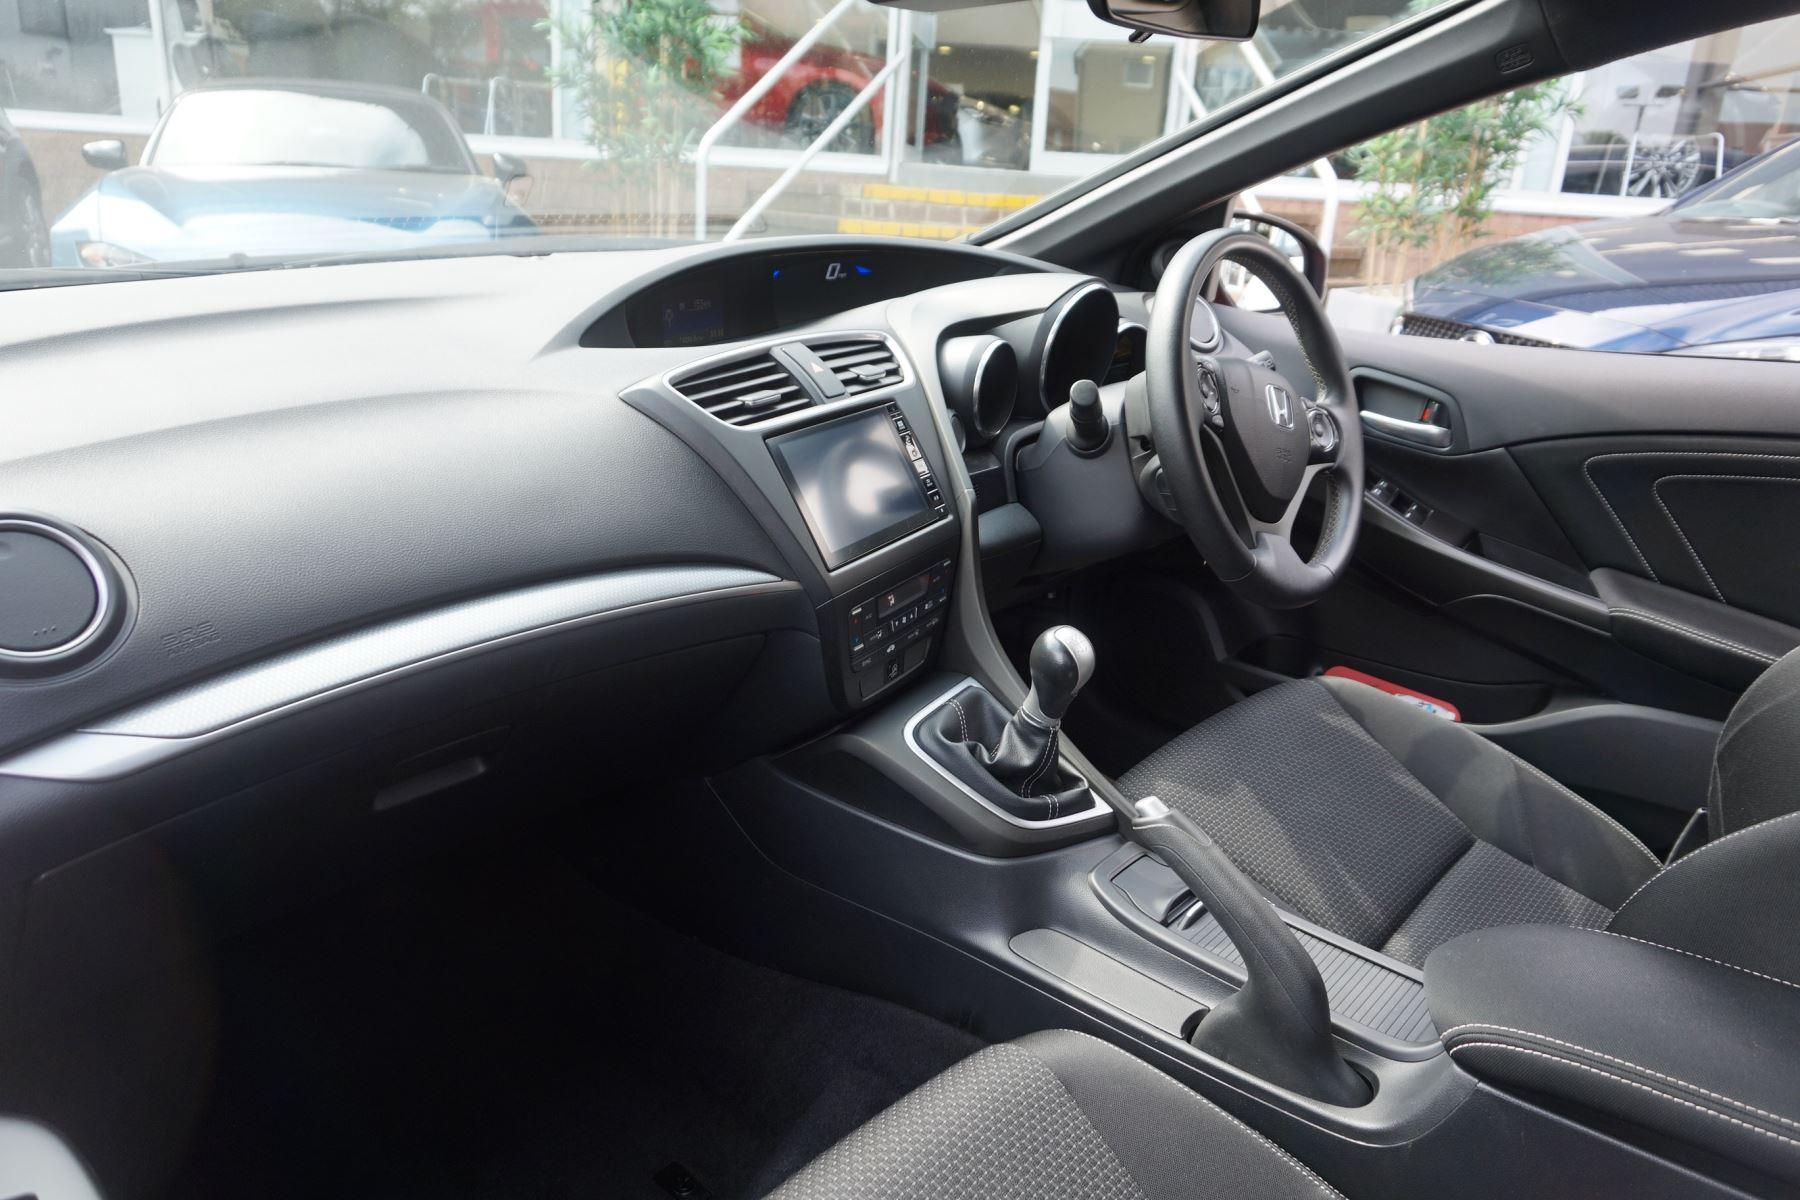 Honda Civic 1.6 i-DTEC Sport [Nav] image 7